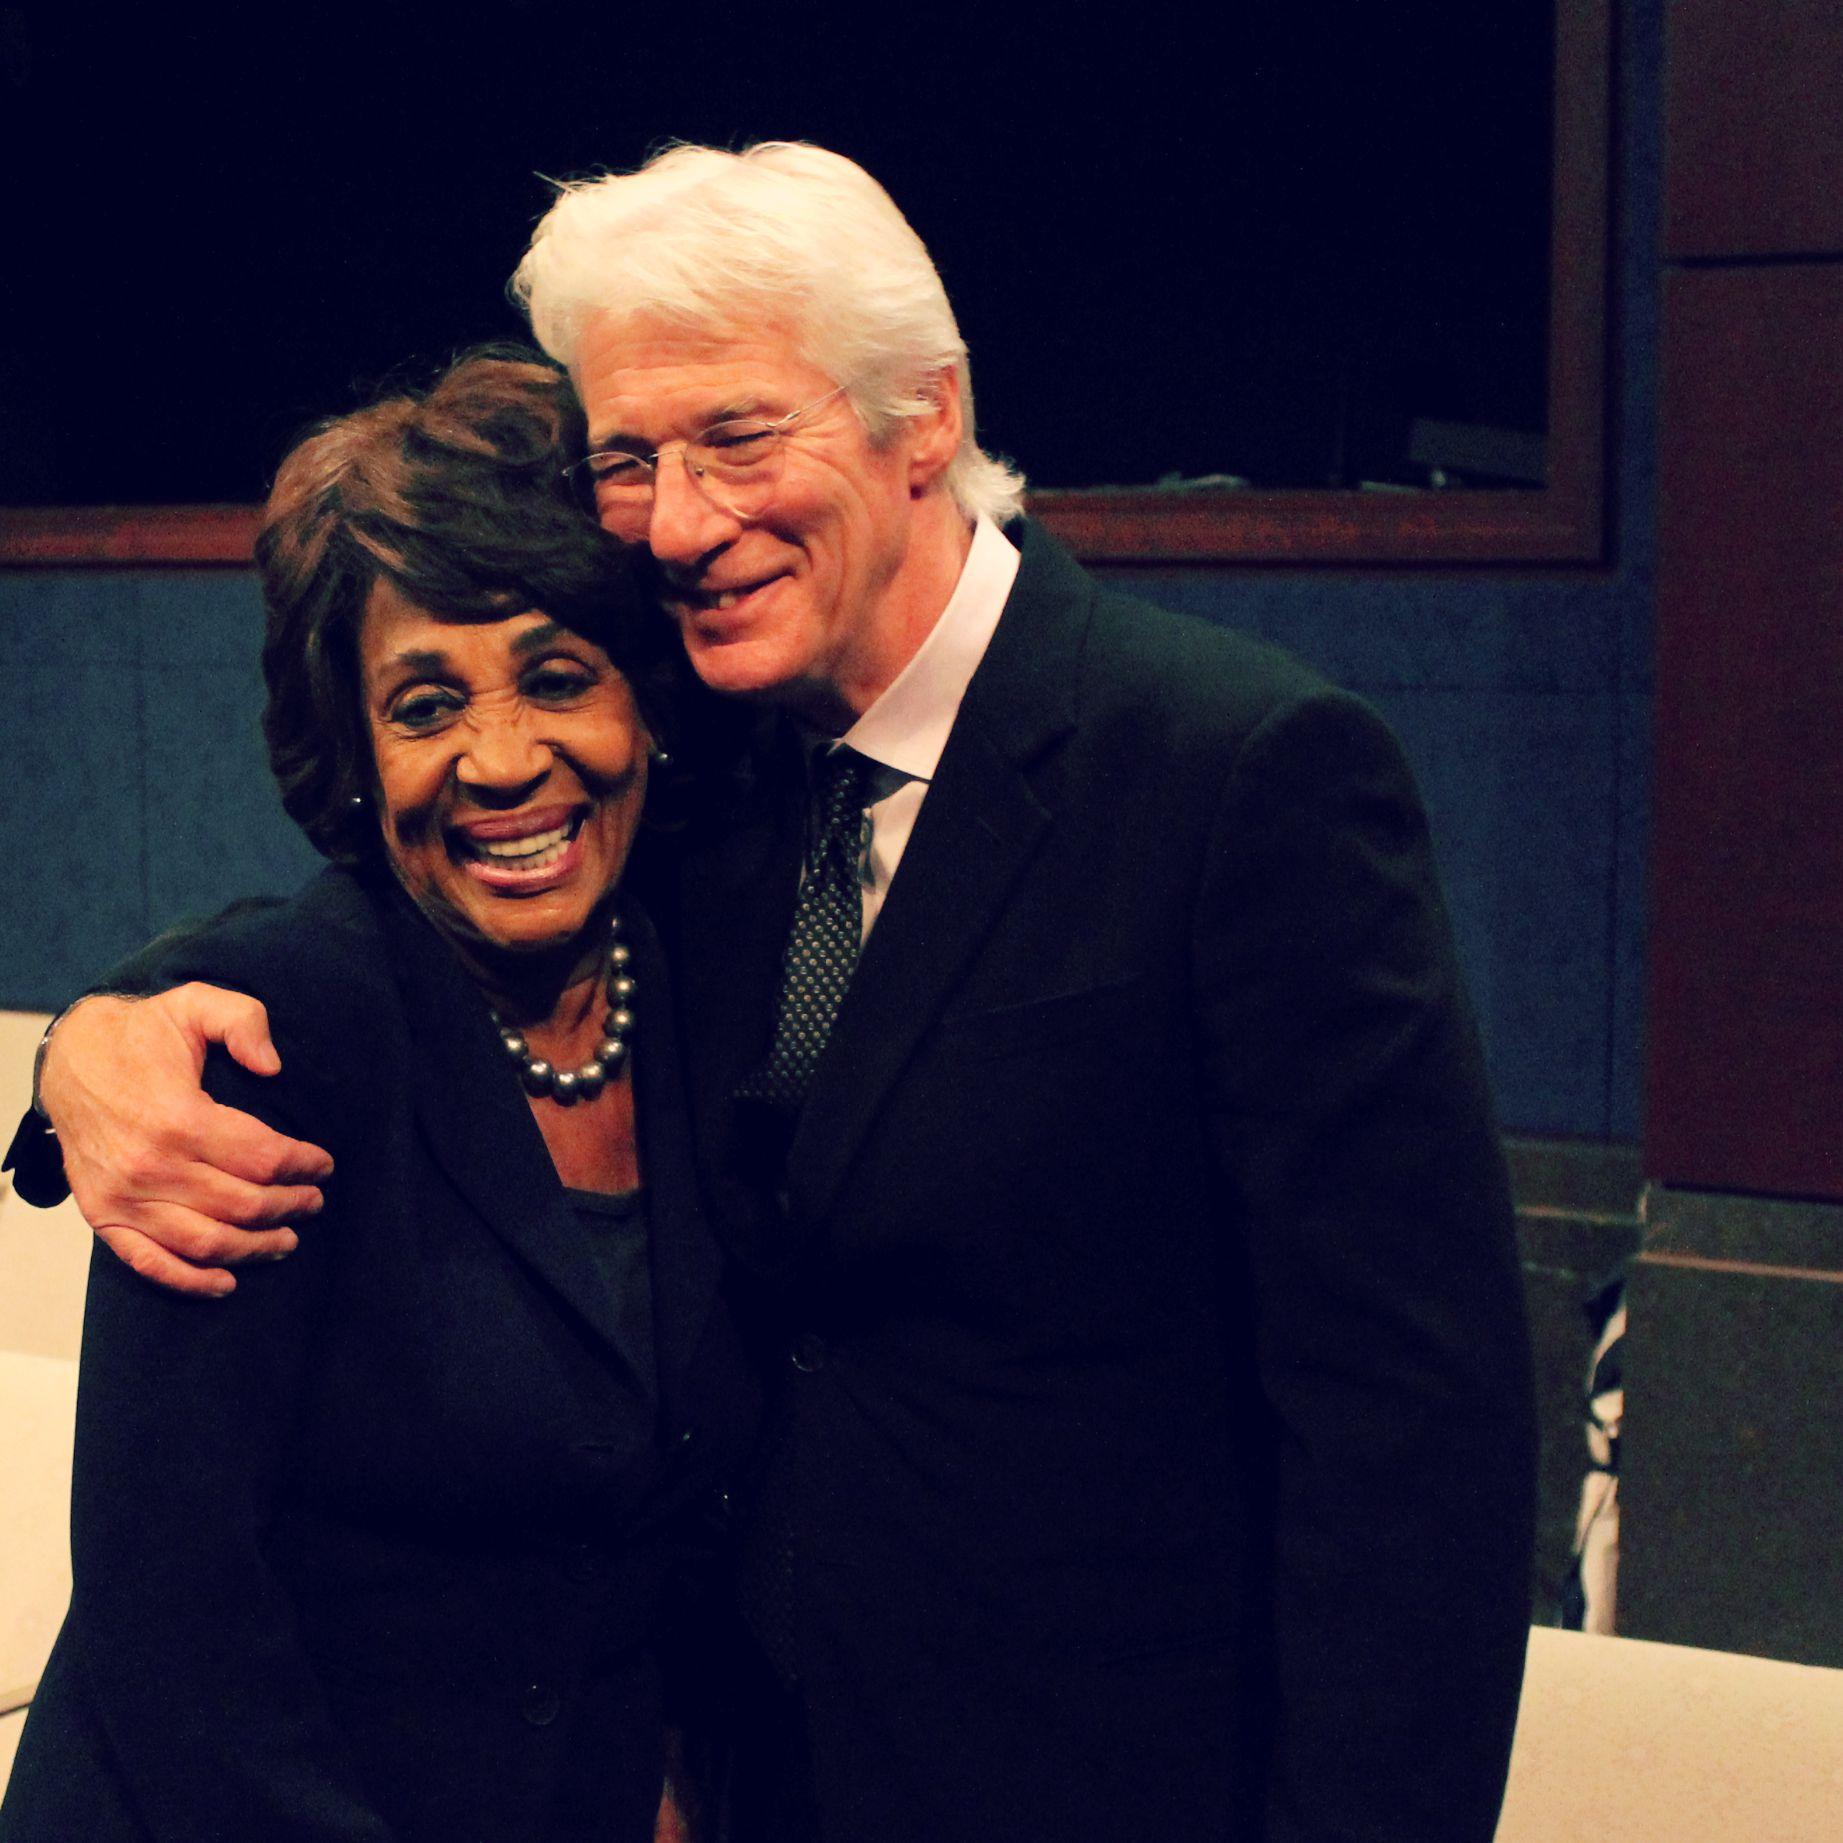 Congresswoman Waters hugs Richard Gere